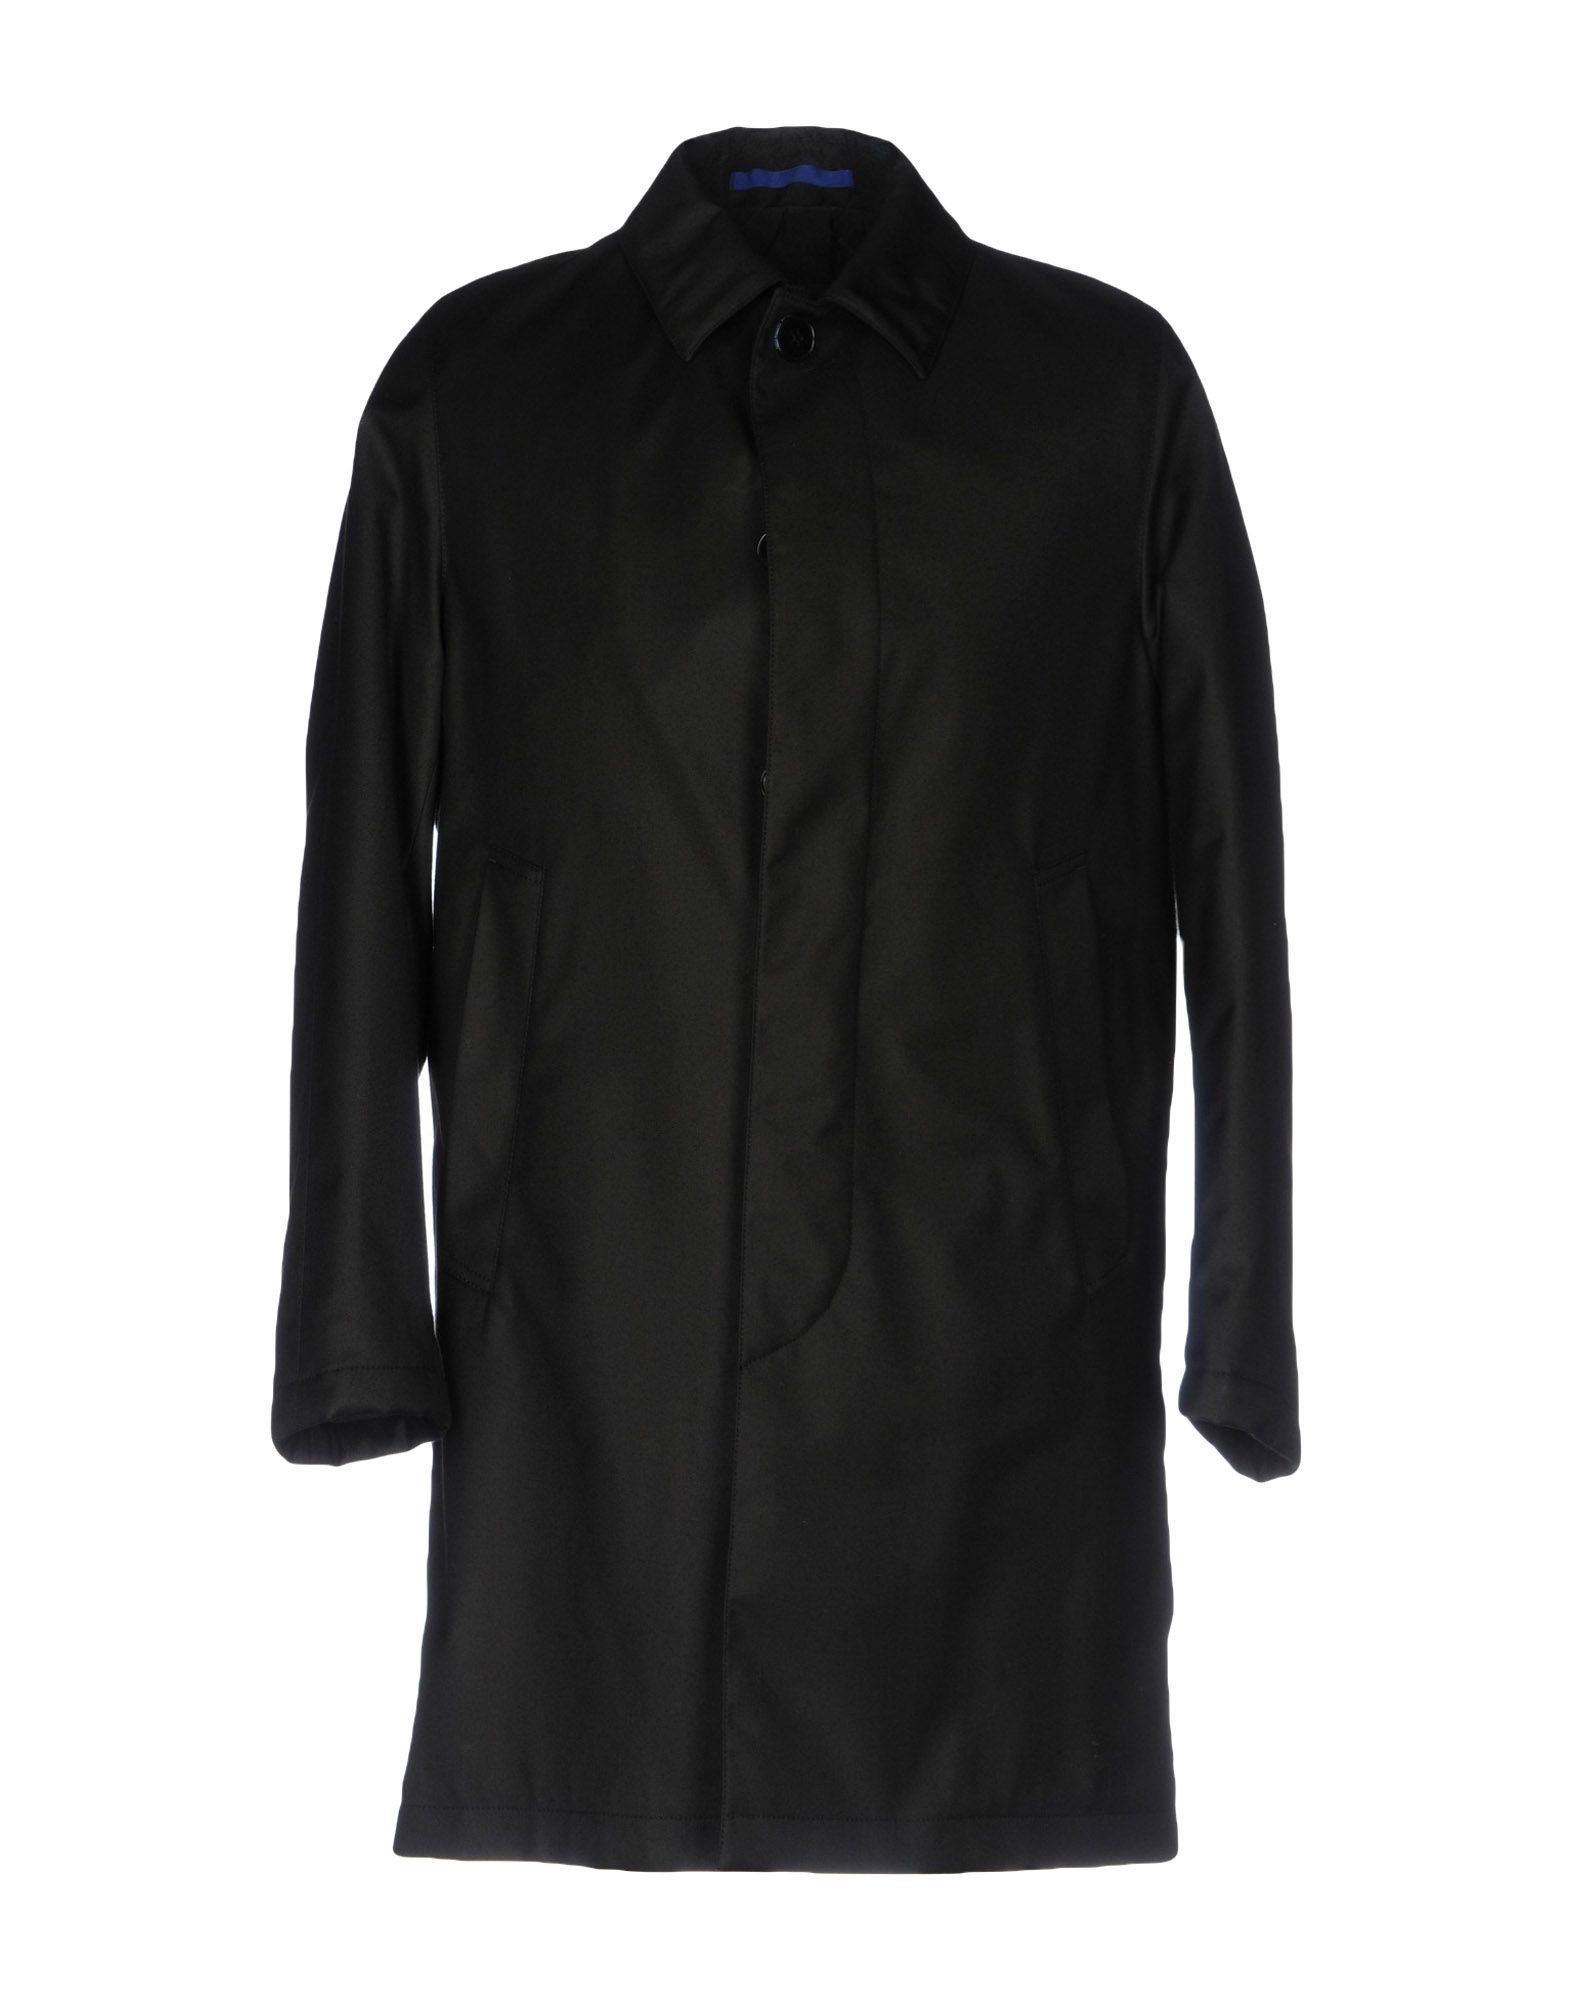 OSCAR JACOBSON Full-Length Jacket in Black